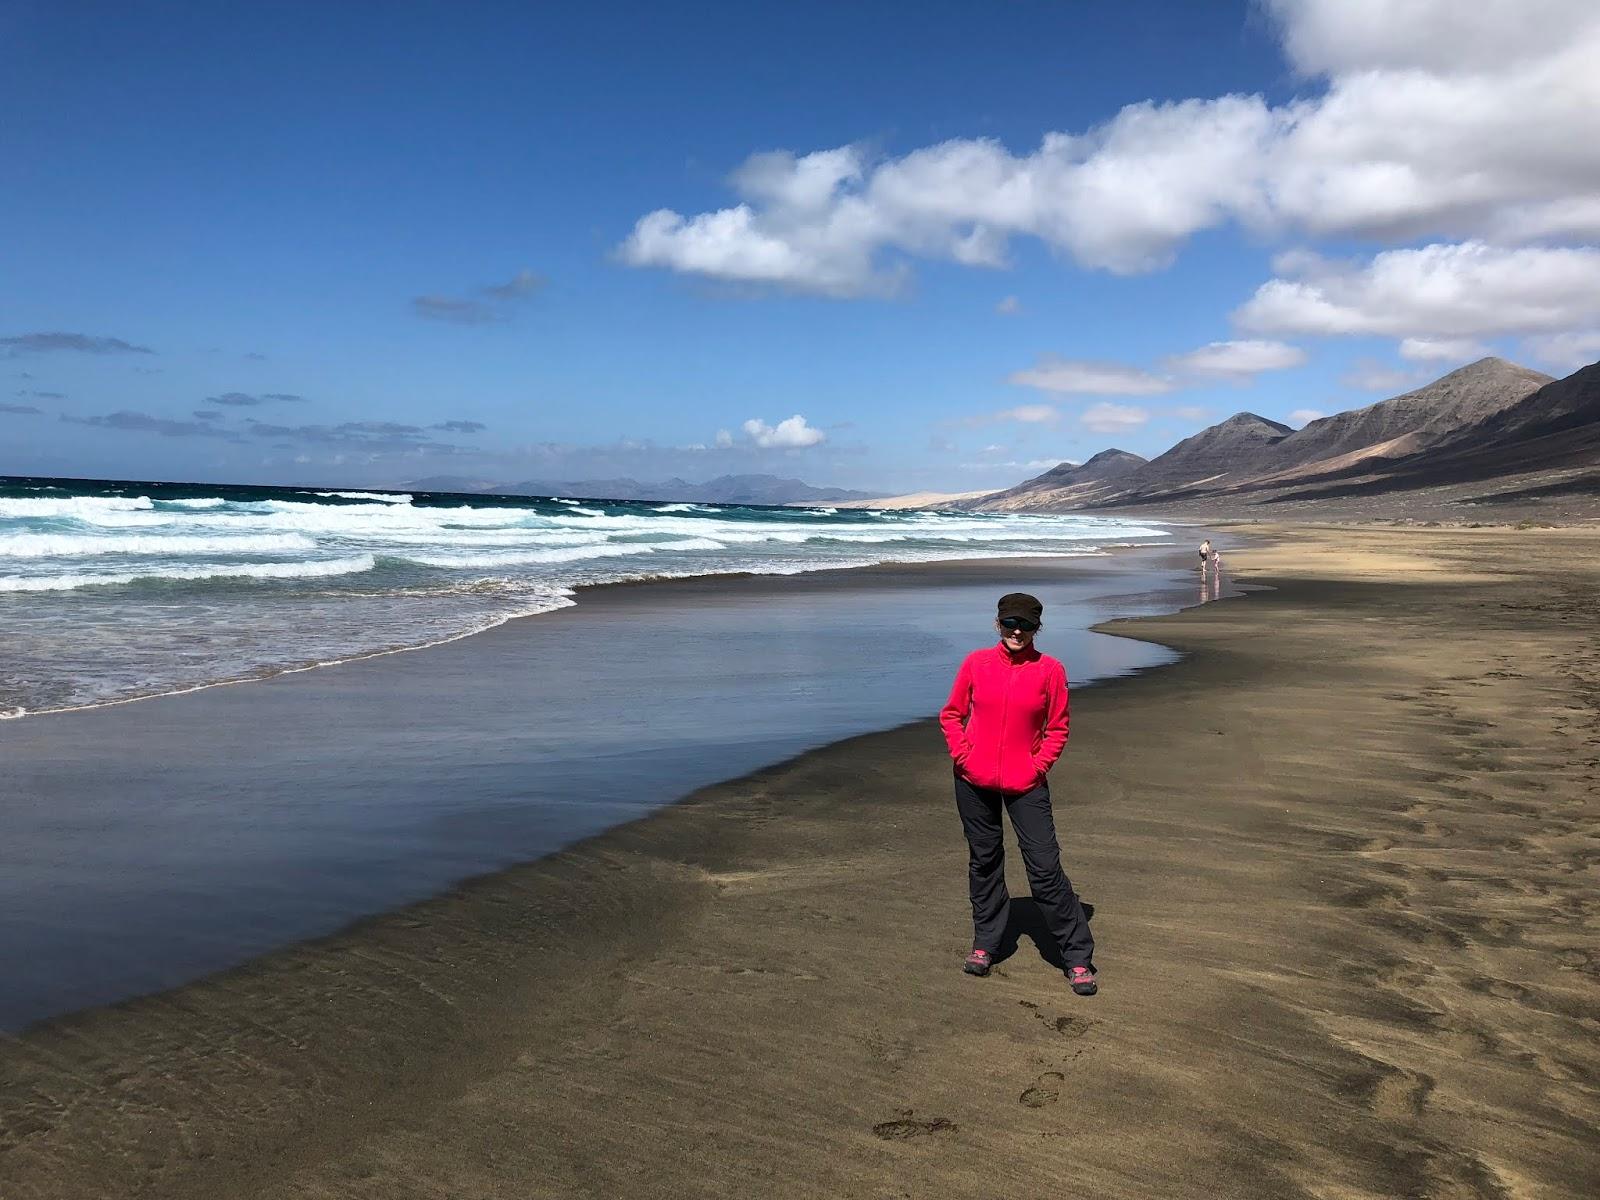 Playa Cofete - La Mejor Playa